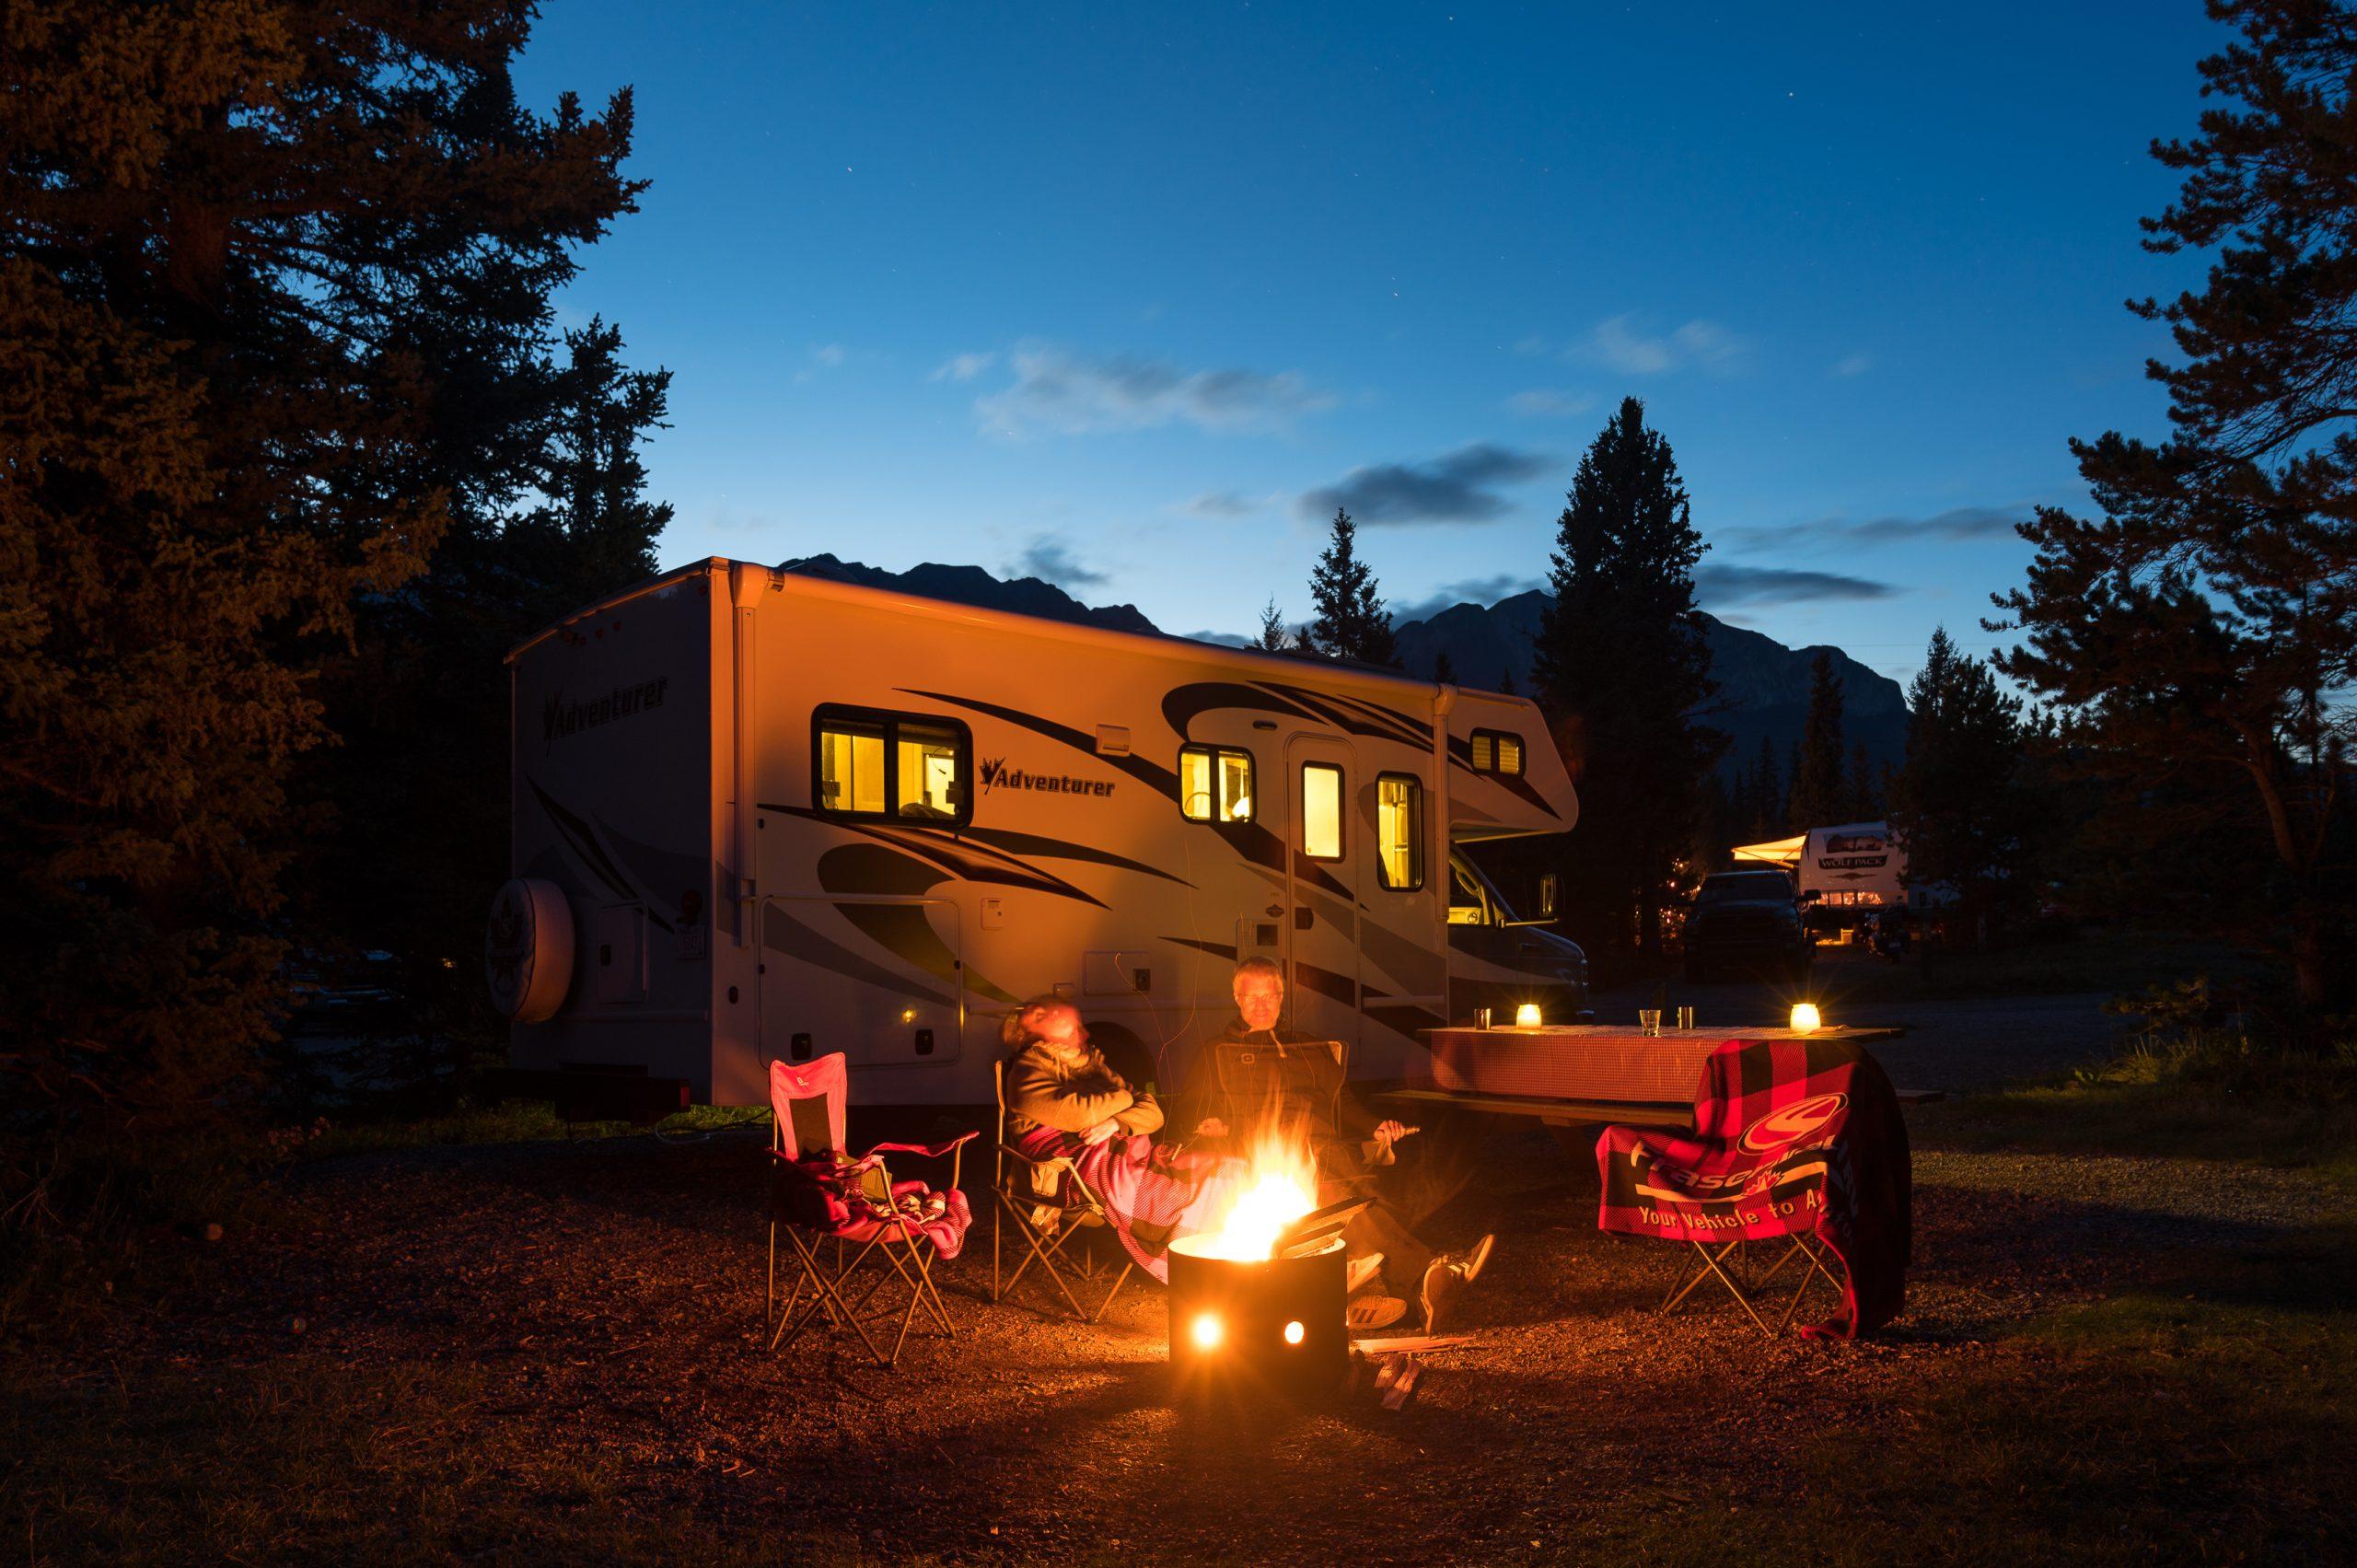 Fraserway camping